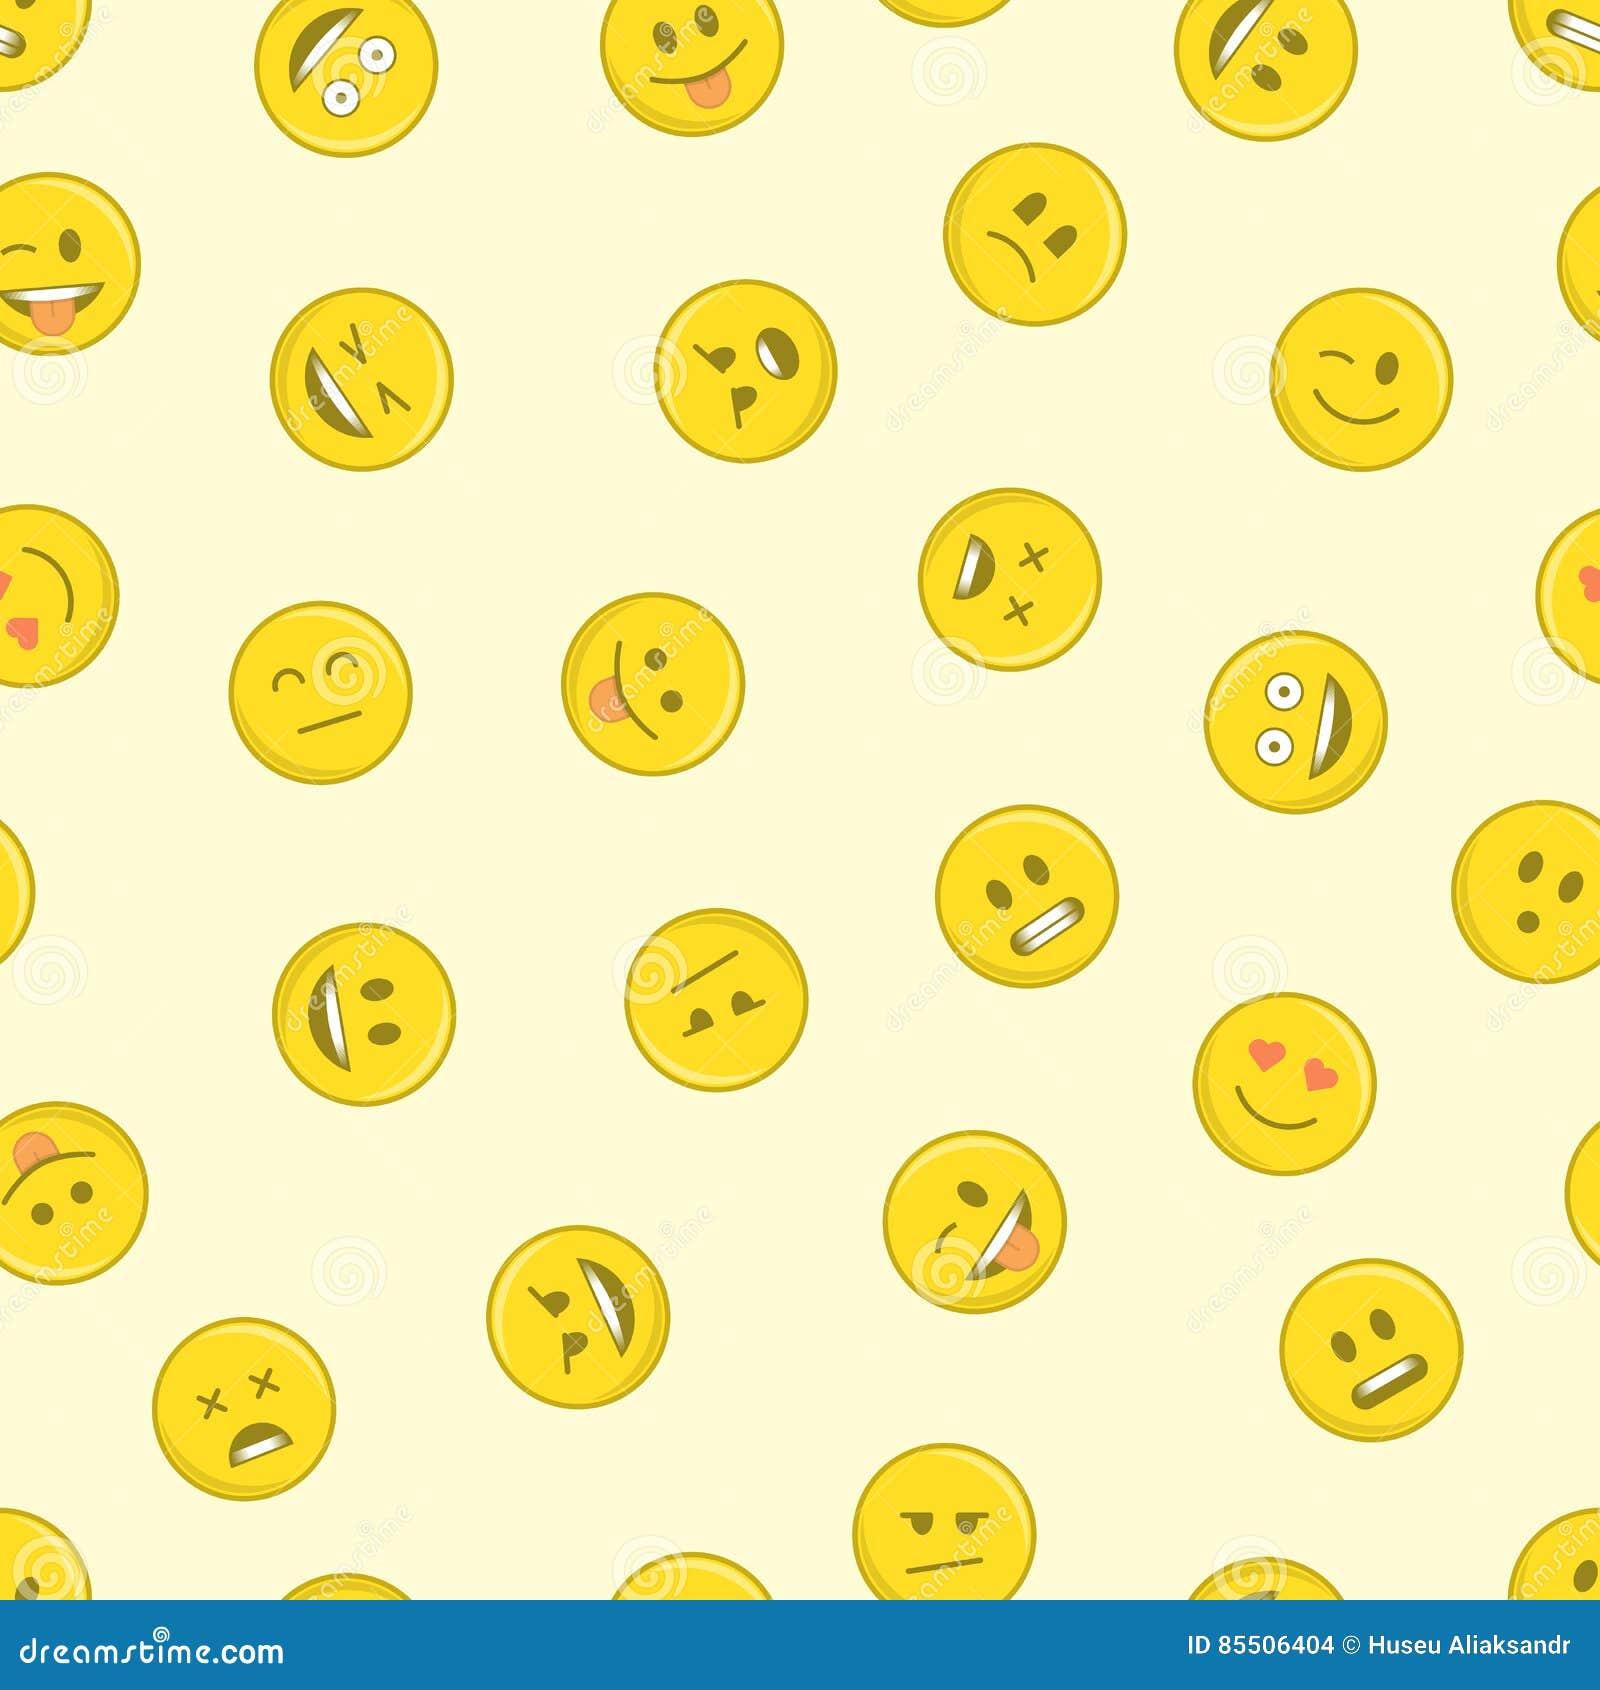 emoji seamless pattern  stock vector  illustration of